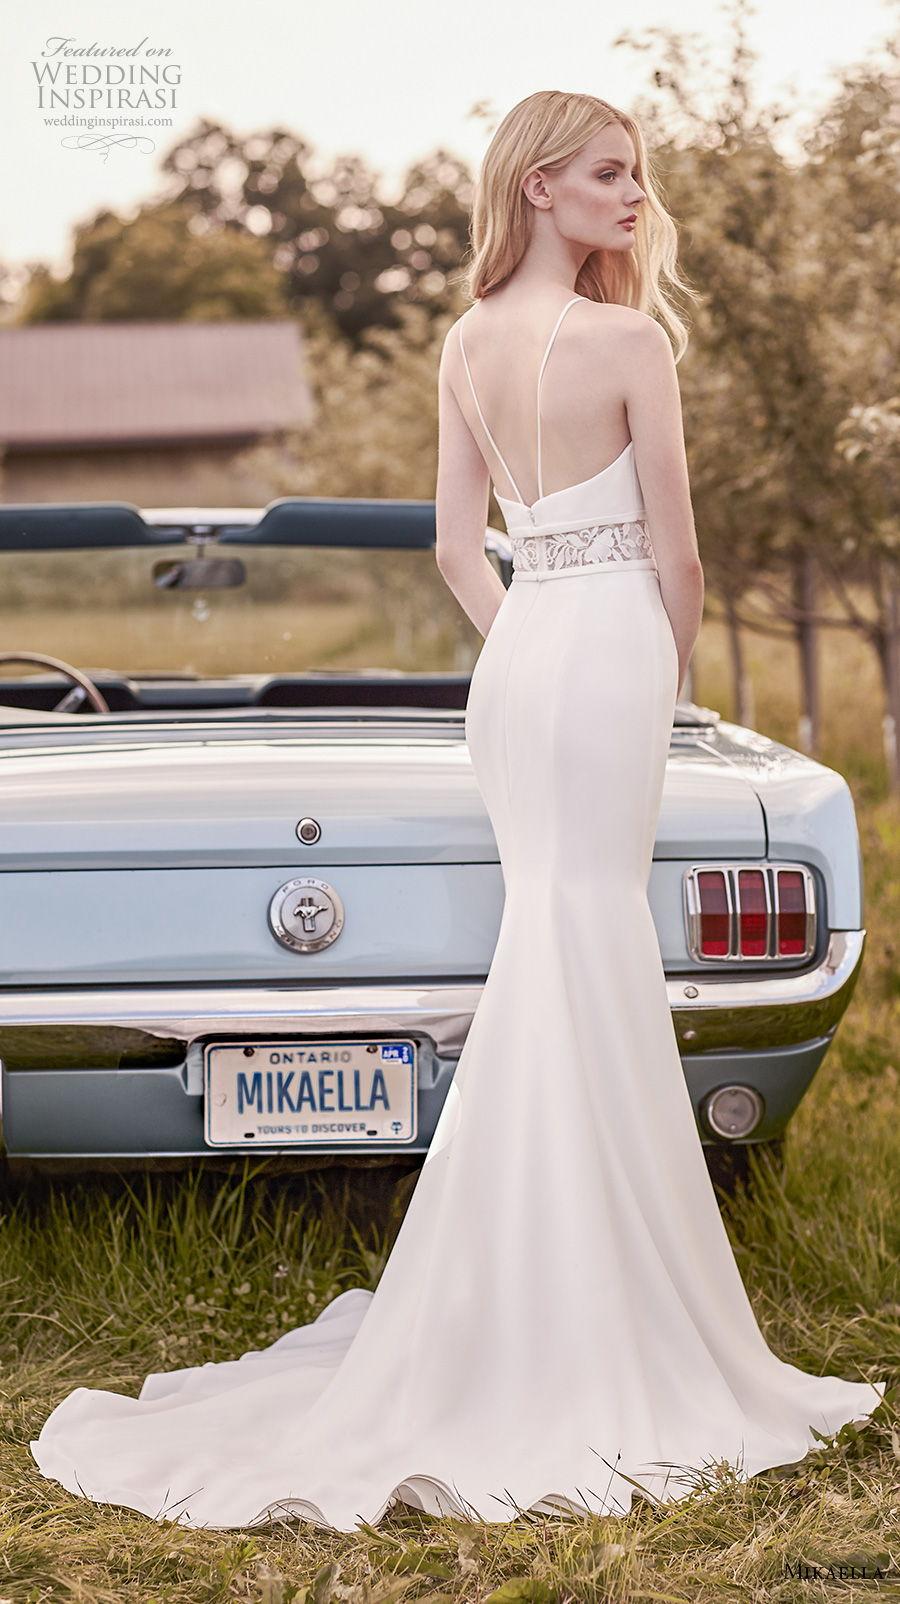 mikaella spring 2020 bridal sleeveles halter jewel neck simple elegant fit and flare sheath wedding dress backless medium train (15) bv